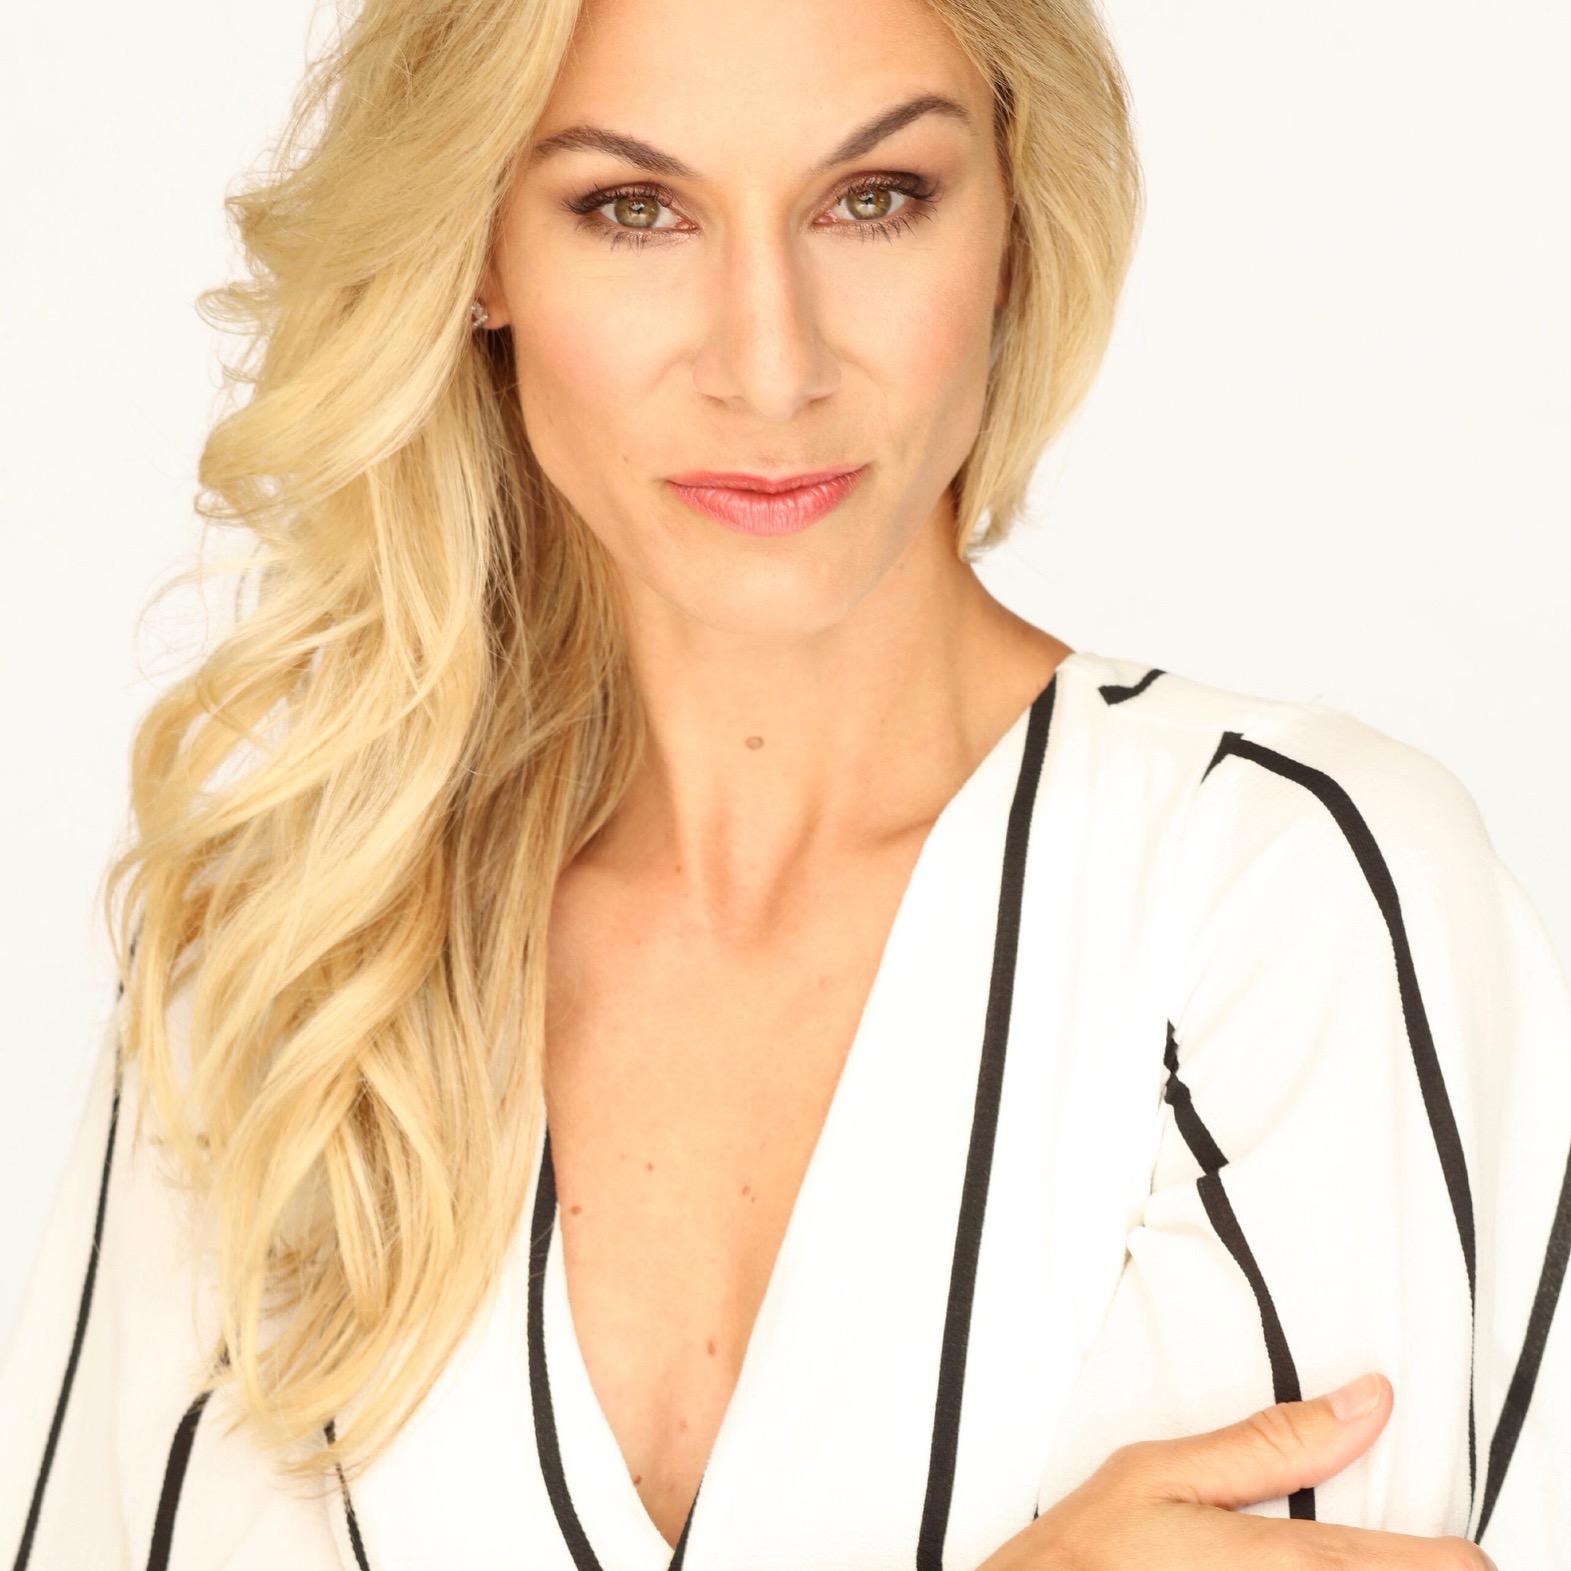 Choreographer - Miss USA system, Vanbros & Assoc. Pageant Choreographer